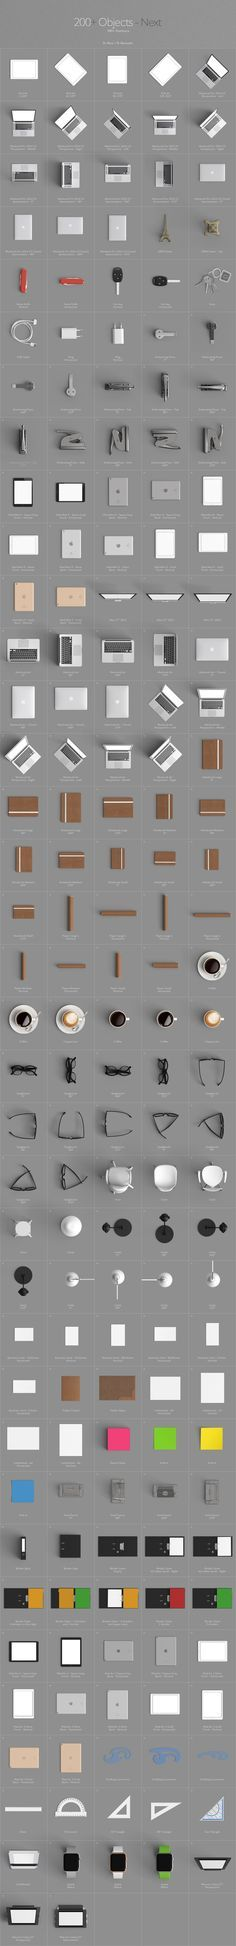 Header & Stationery Mock Up Creator by Qeaql on Creative Market #stationary #mockup #photoshop